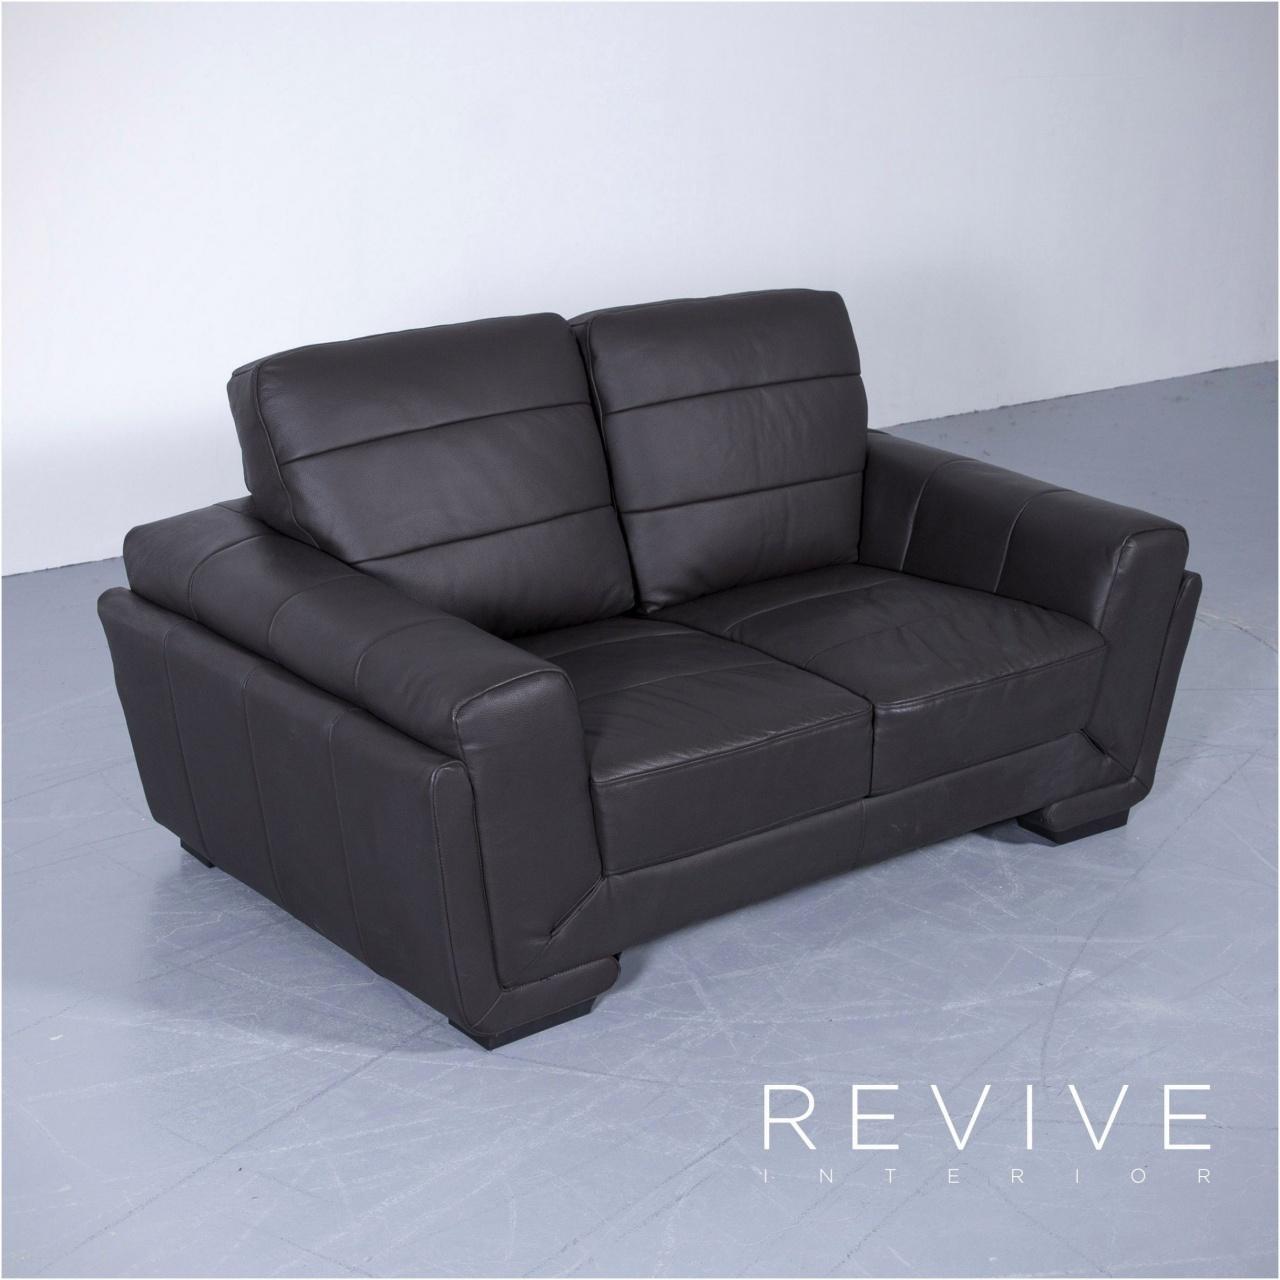 difference between sofa and loveseat 2 0d luxus ikea luxus grau bmw sofa ikea luft ikea sofa x3 from difference between sofa and loveseat